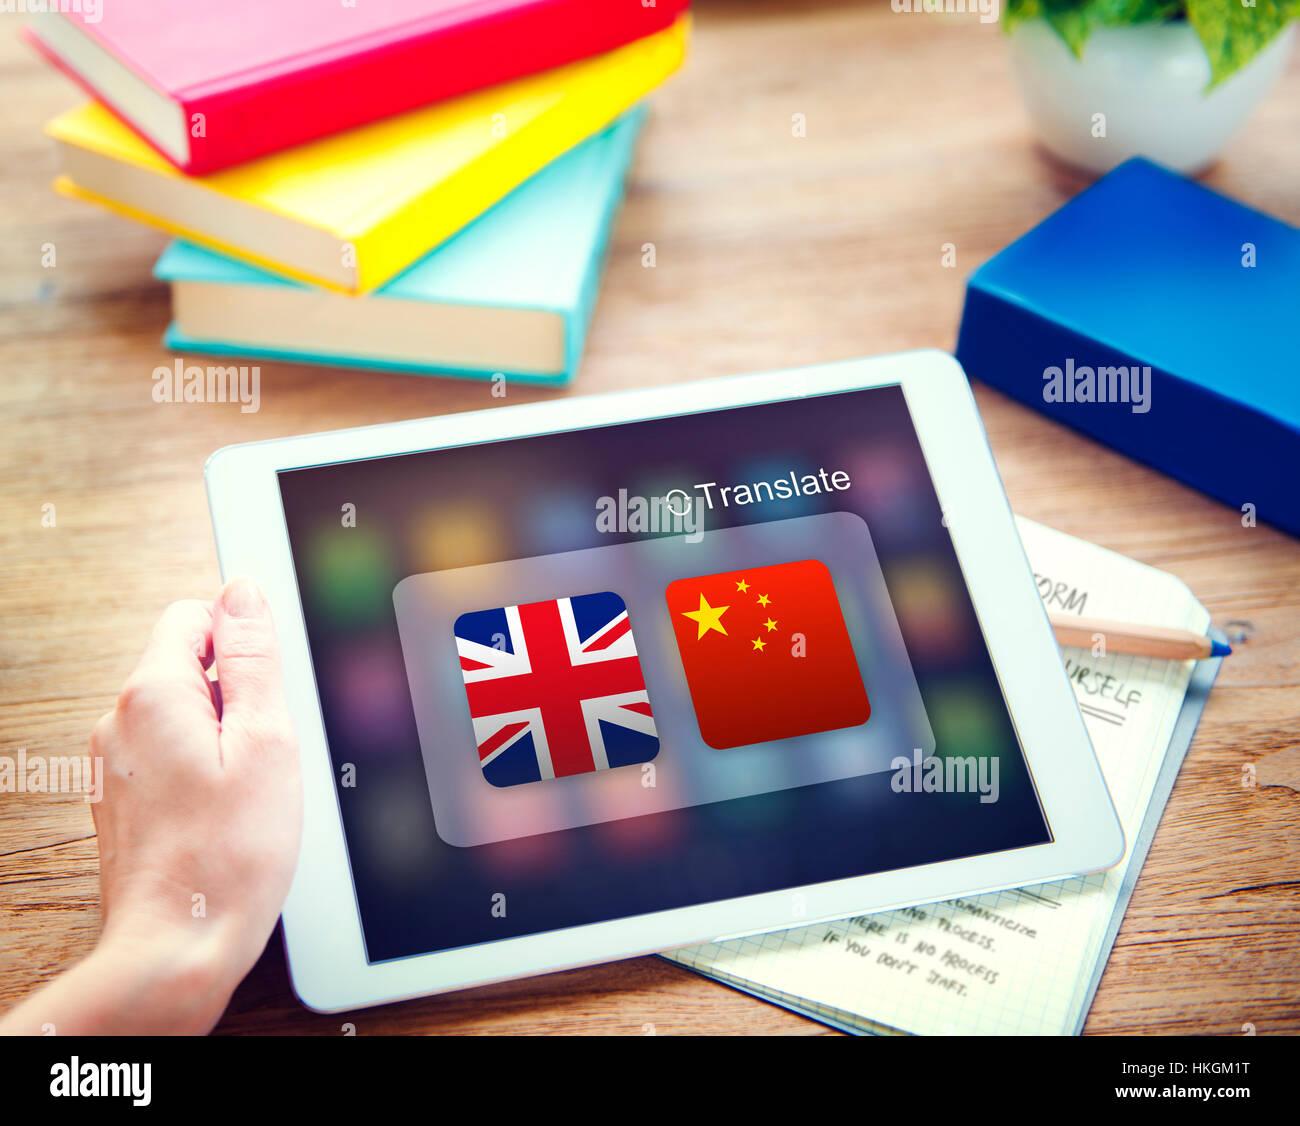 English Chinese Languages Translation Application Concept - Stock Image